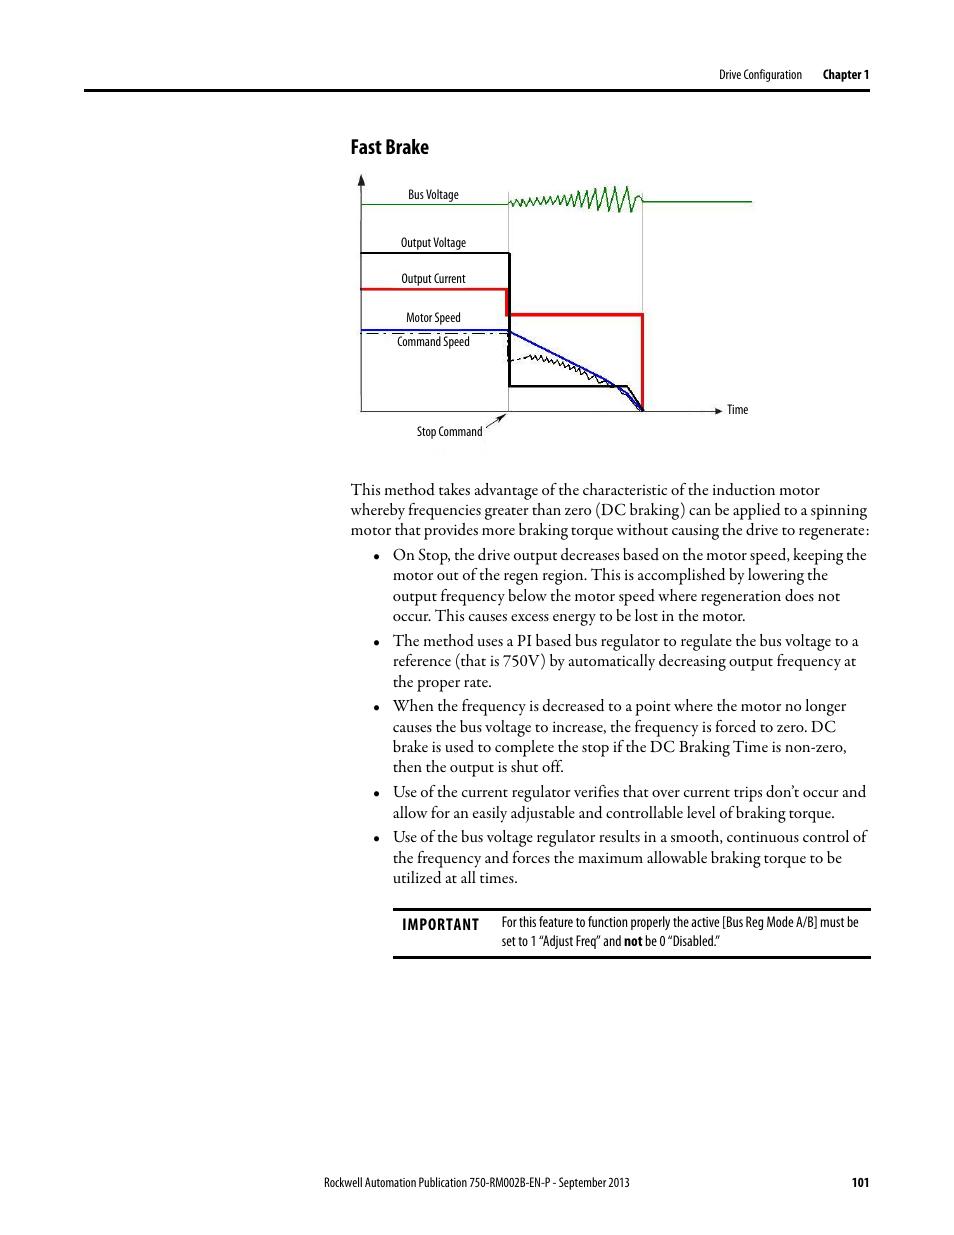 powerflex 750 user manual